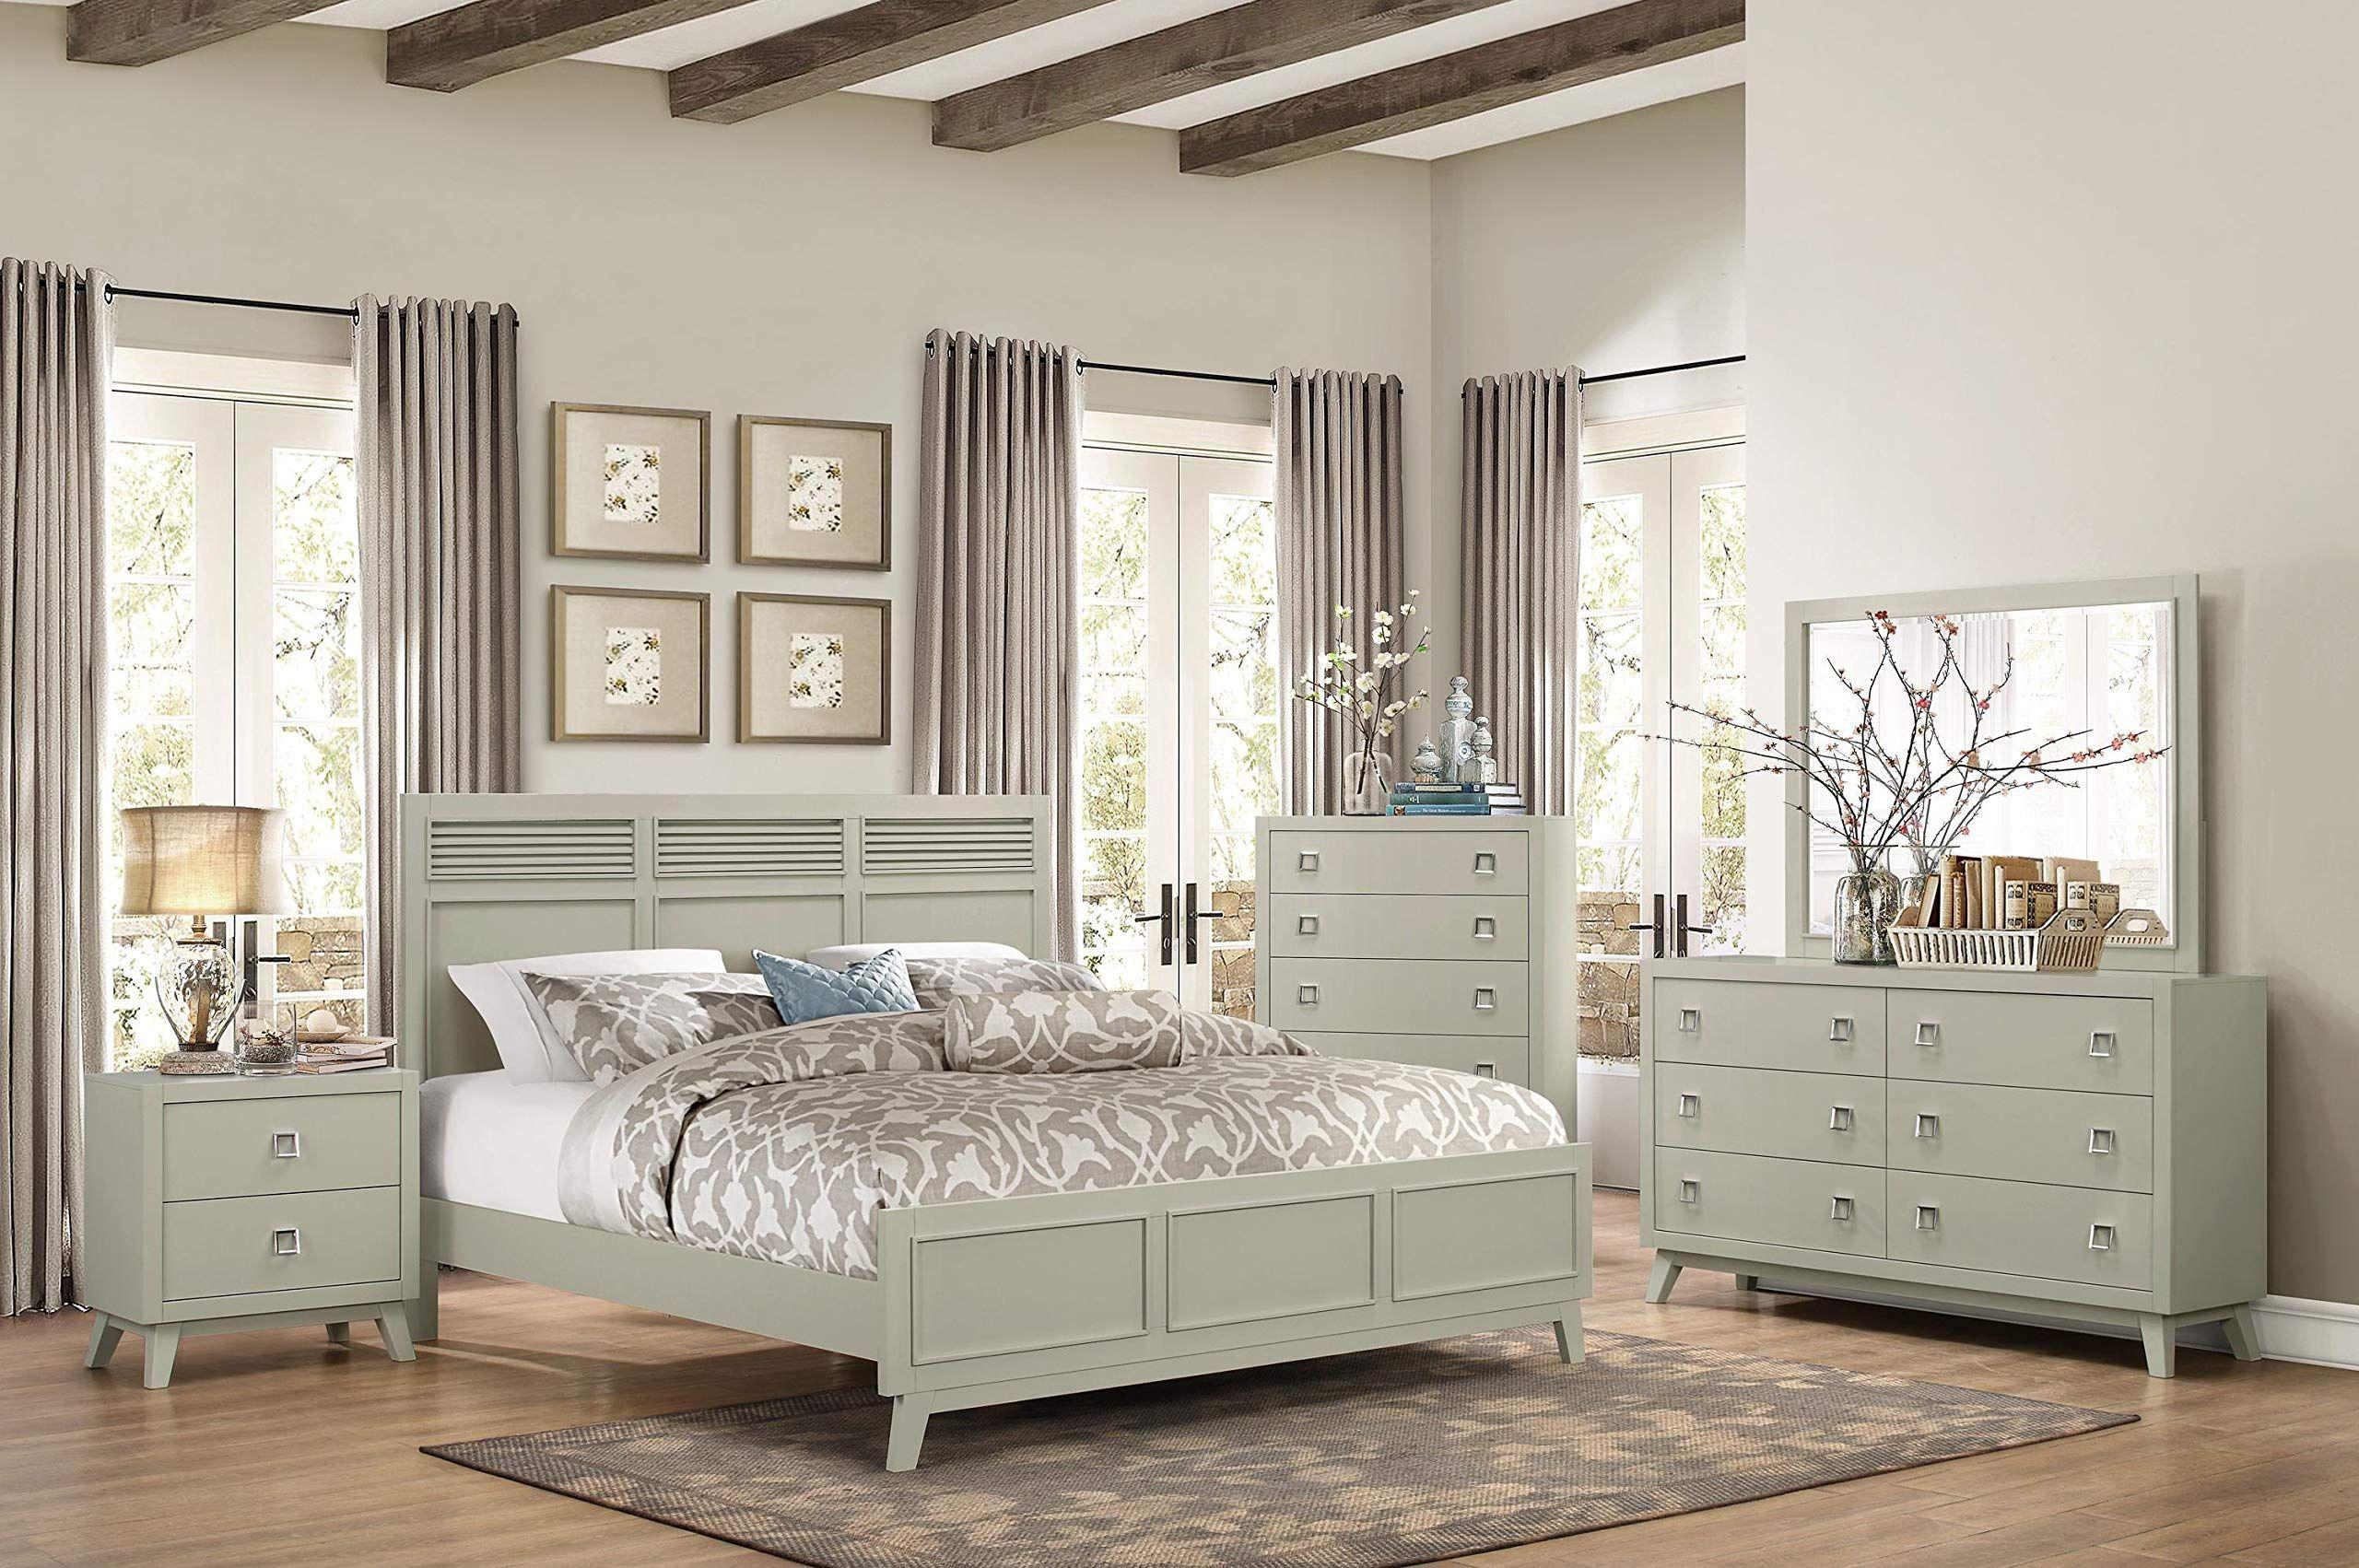 valas coastal 5pc bedroom set cal king bed dresser mirror